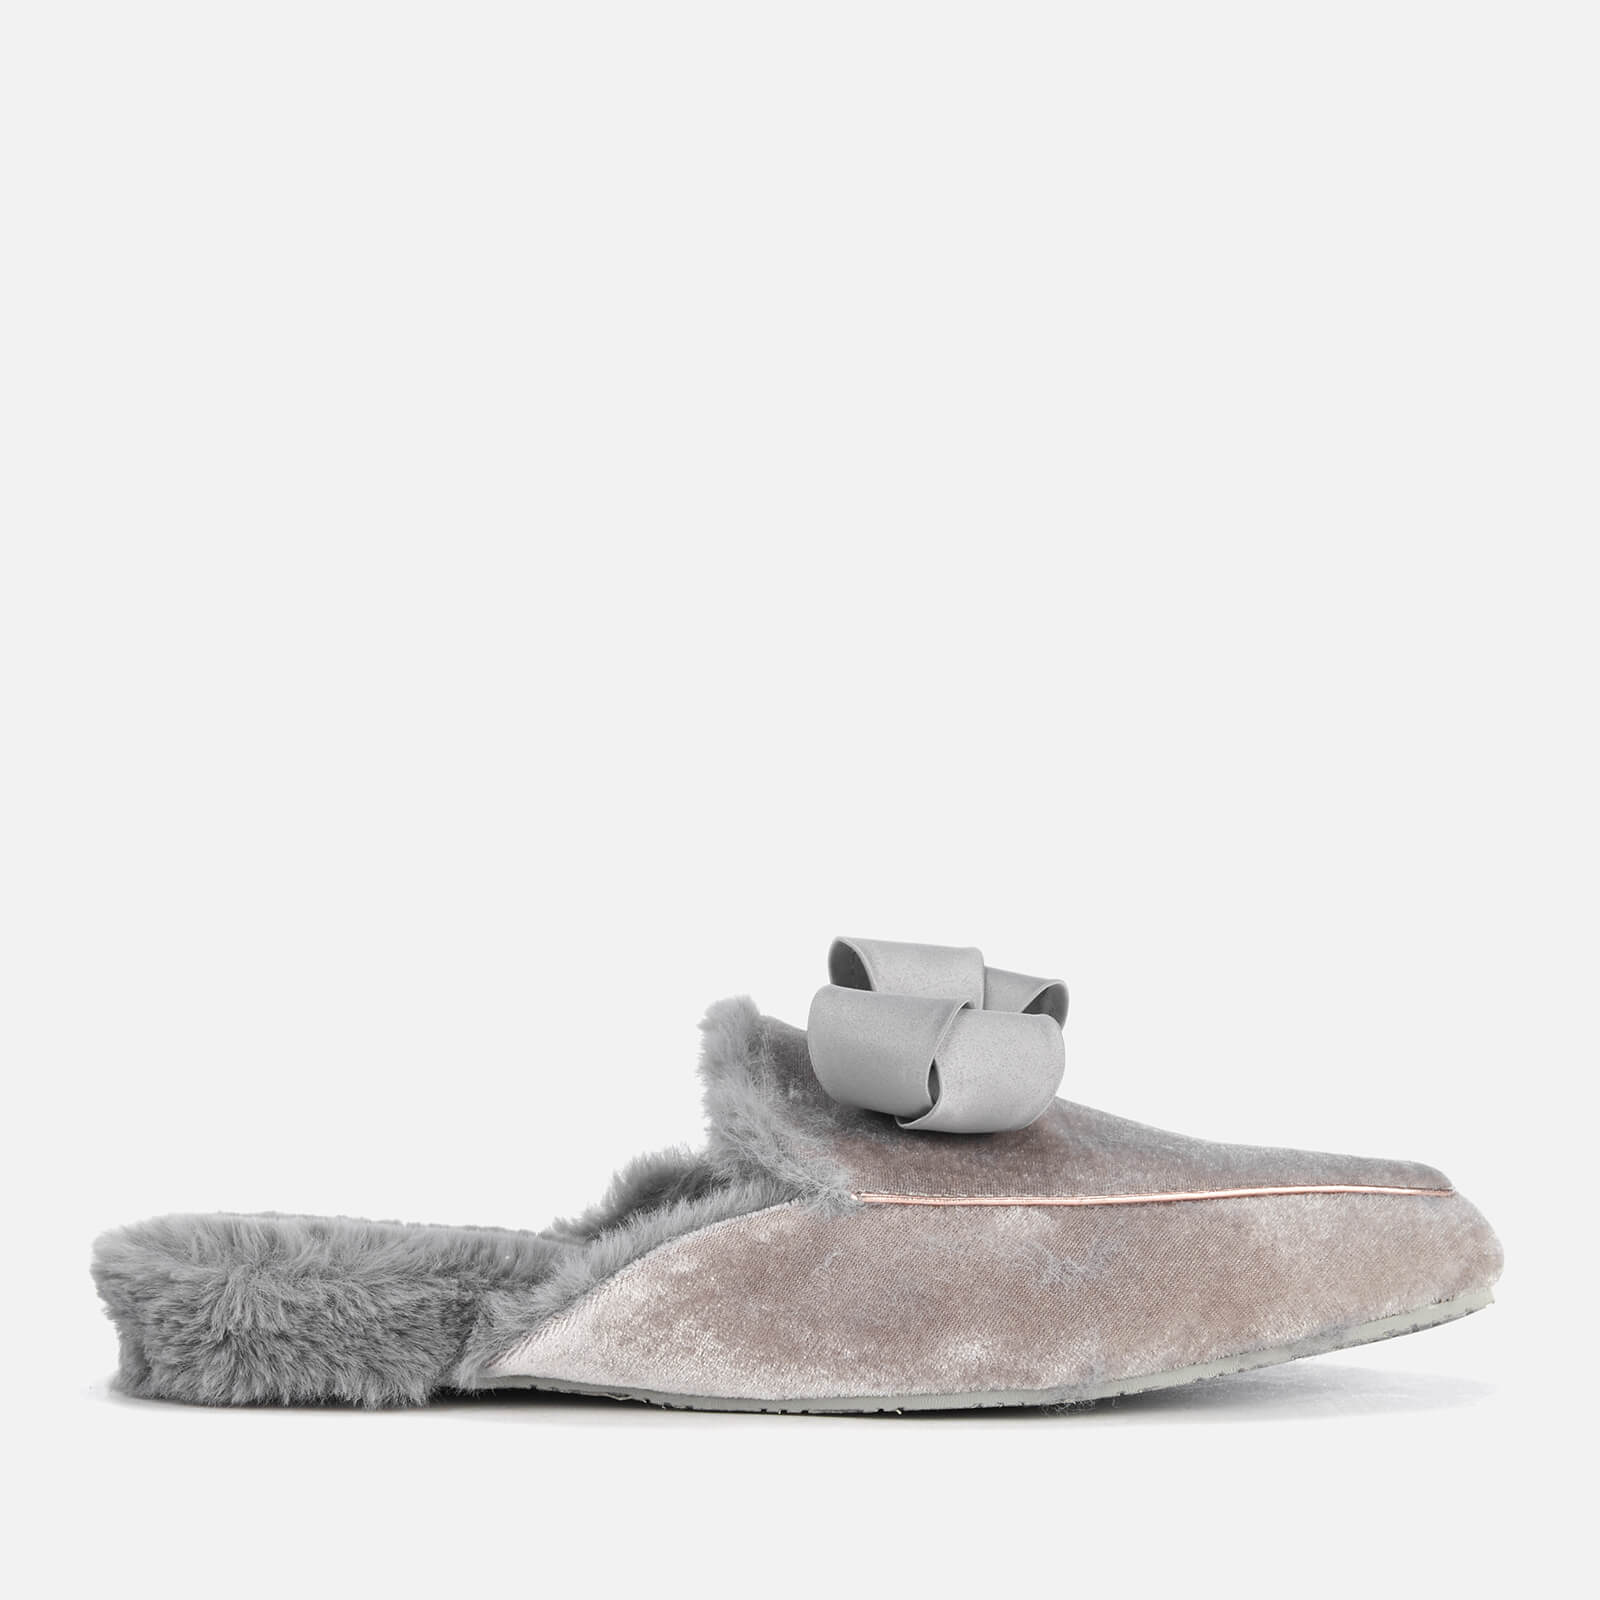 f4a81312a Ted Baker Women s Bhaybe Velvet Mule Slippers - Light Grey Womens ...